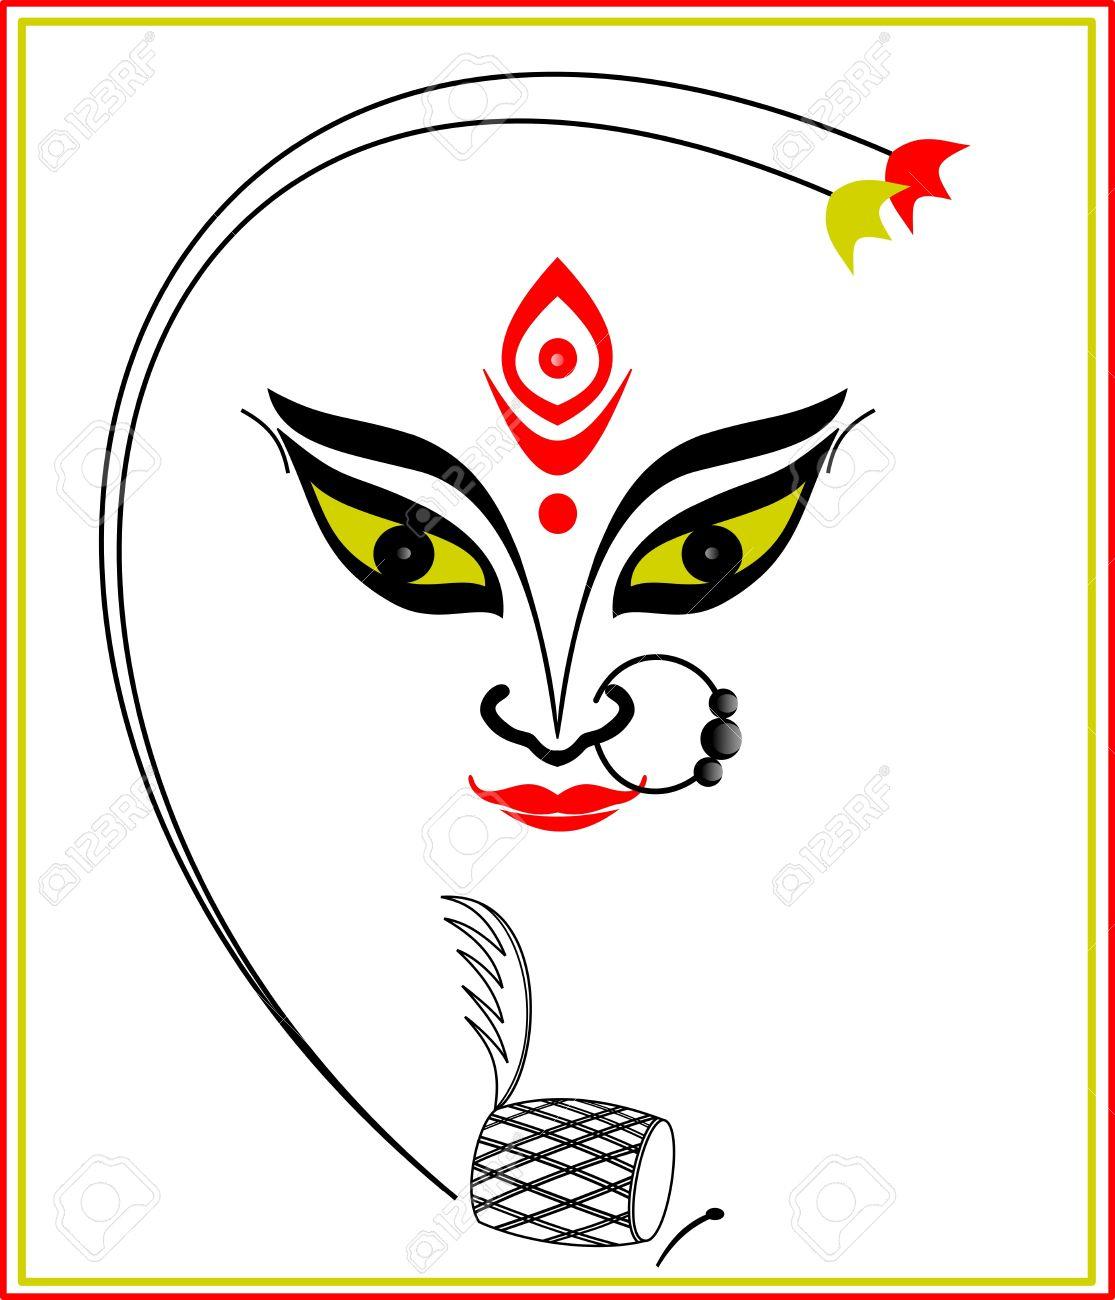 Durga Maa Face Sketches Hindu Clipart Go-Durga Maa Face Sketches Hindu Clipart Goddess Durga u2013 Pencil And In Color  Hindu Clipart-4